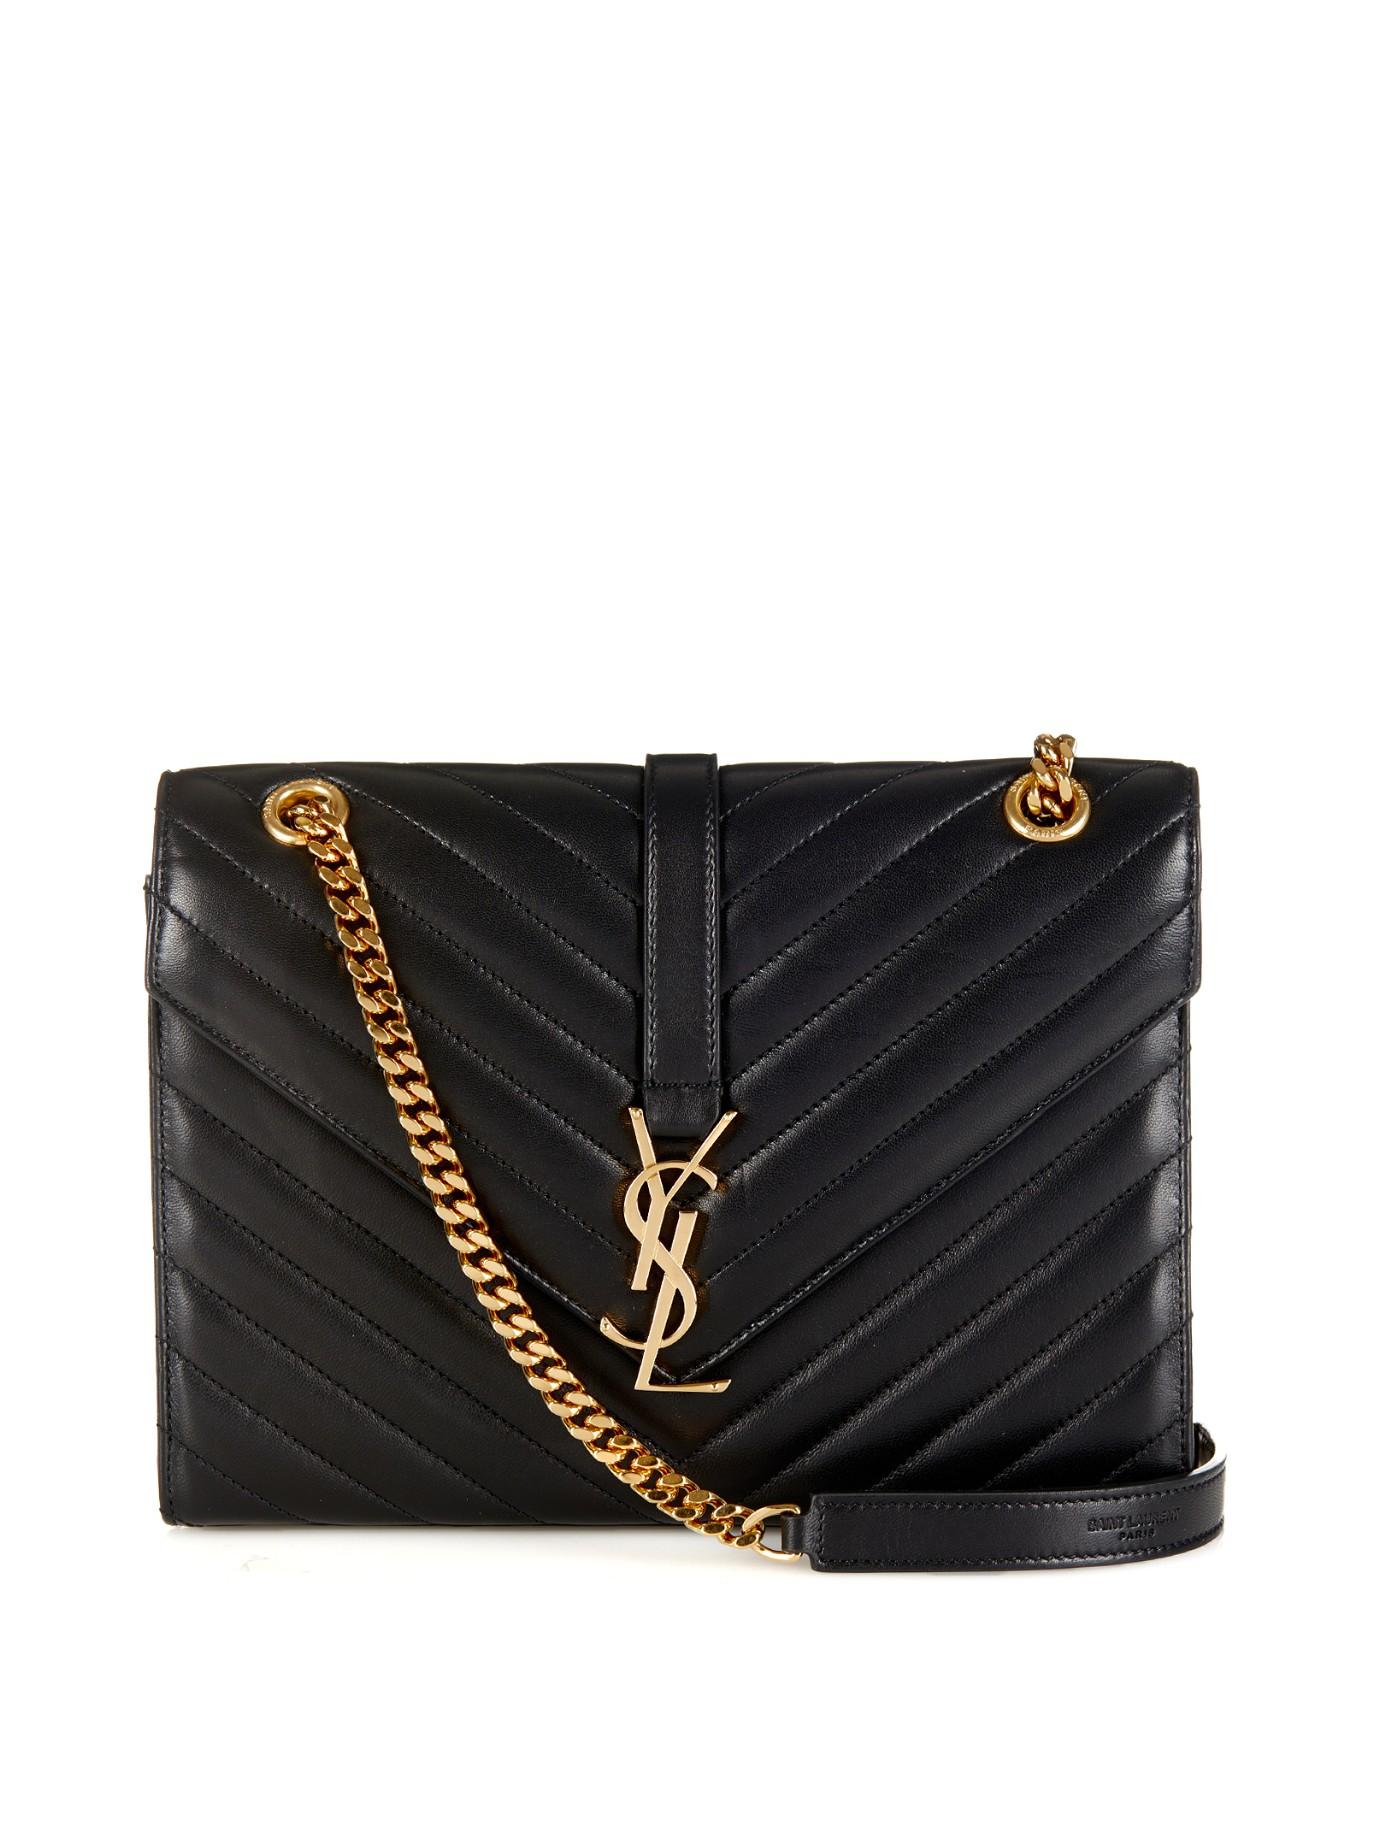 Ysl Tassel Crossbody | Yves Saint Laurent Handbags | Ysl Crossbody Bag